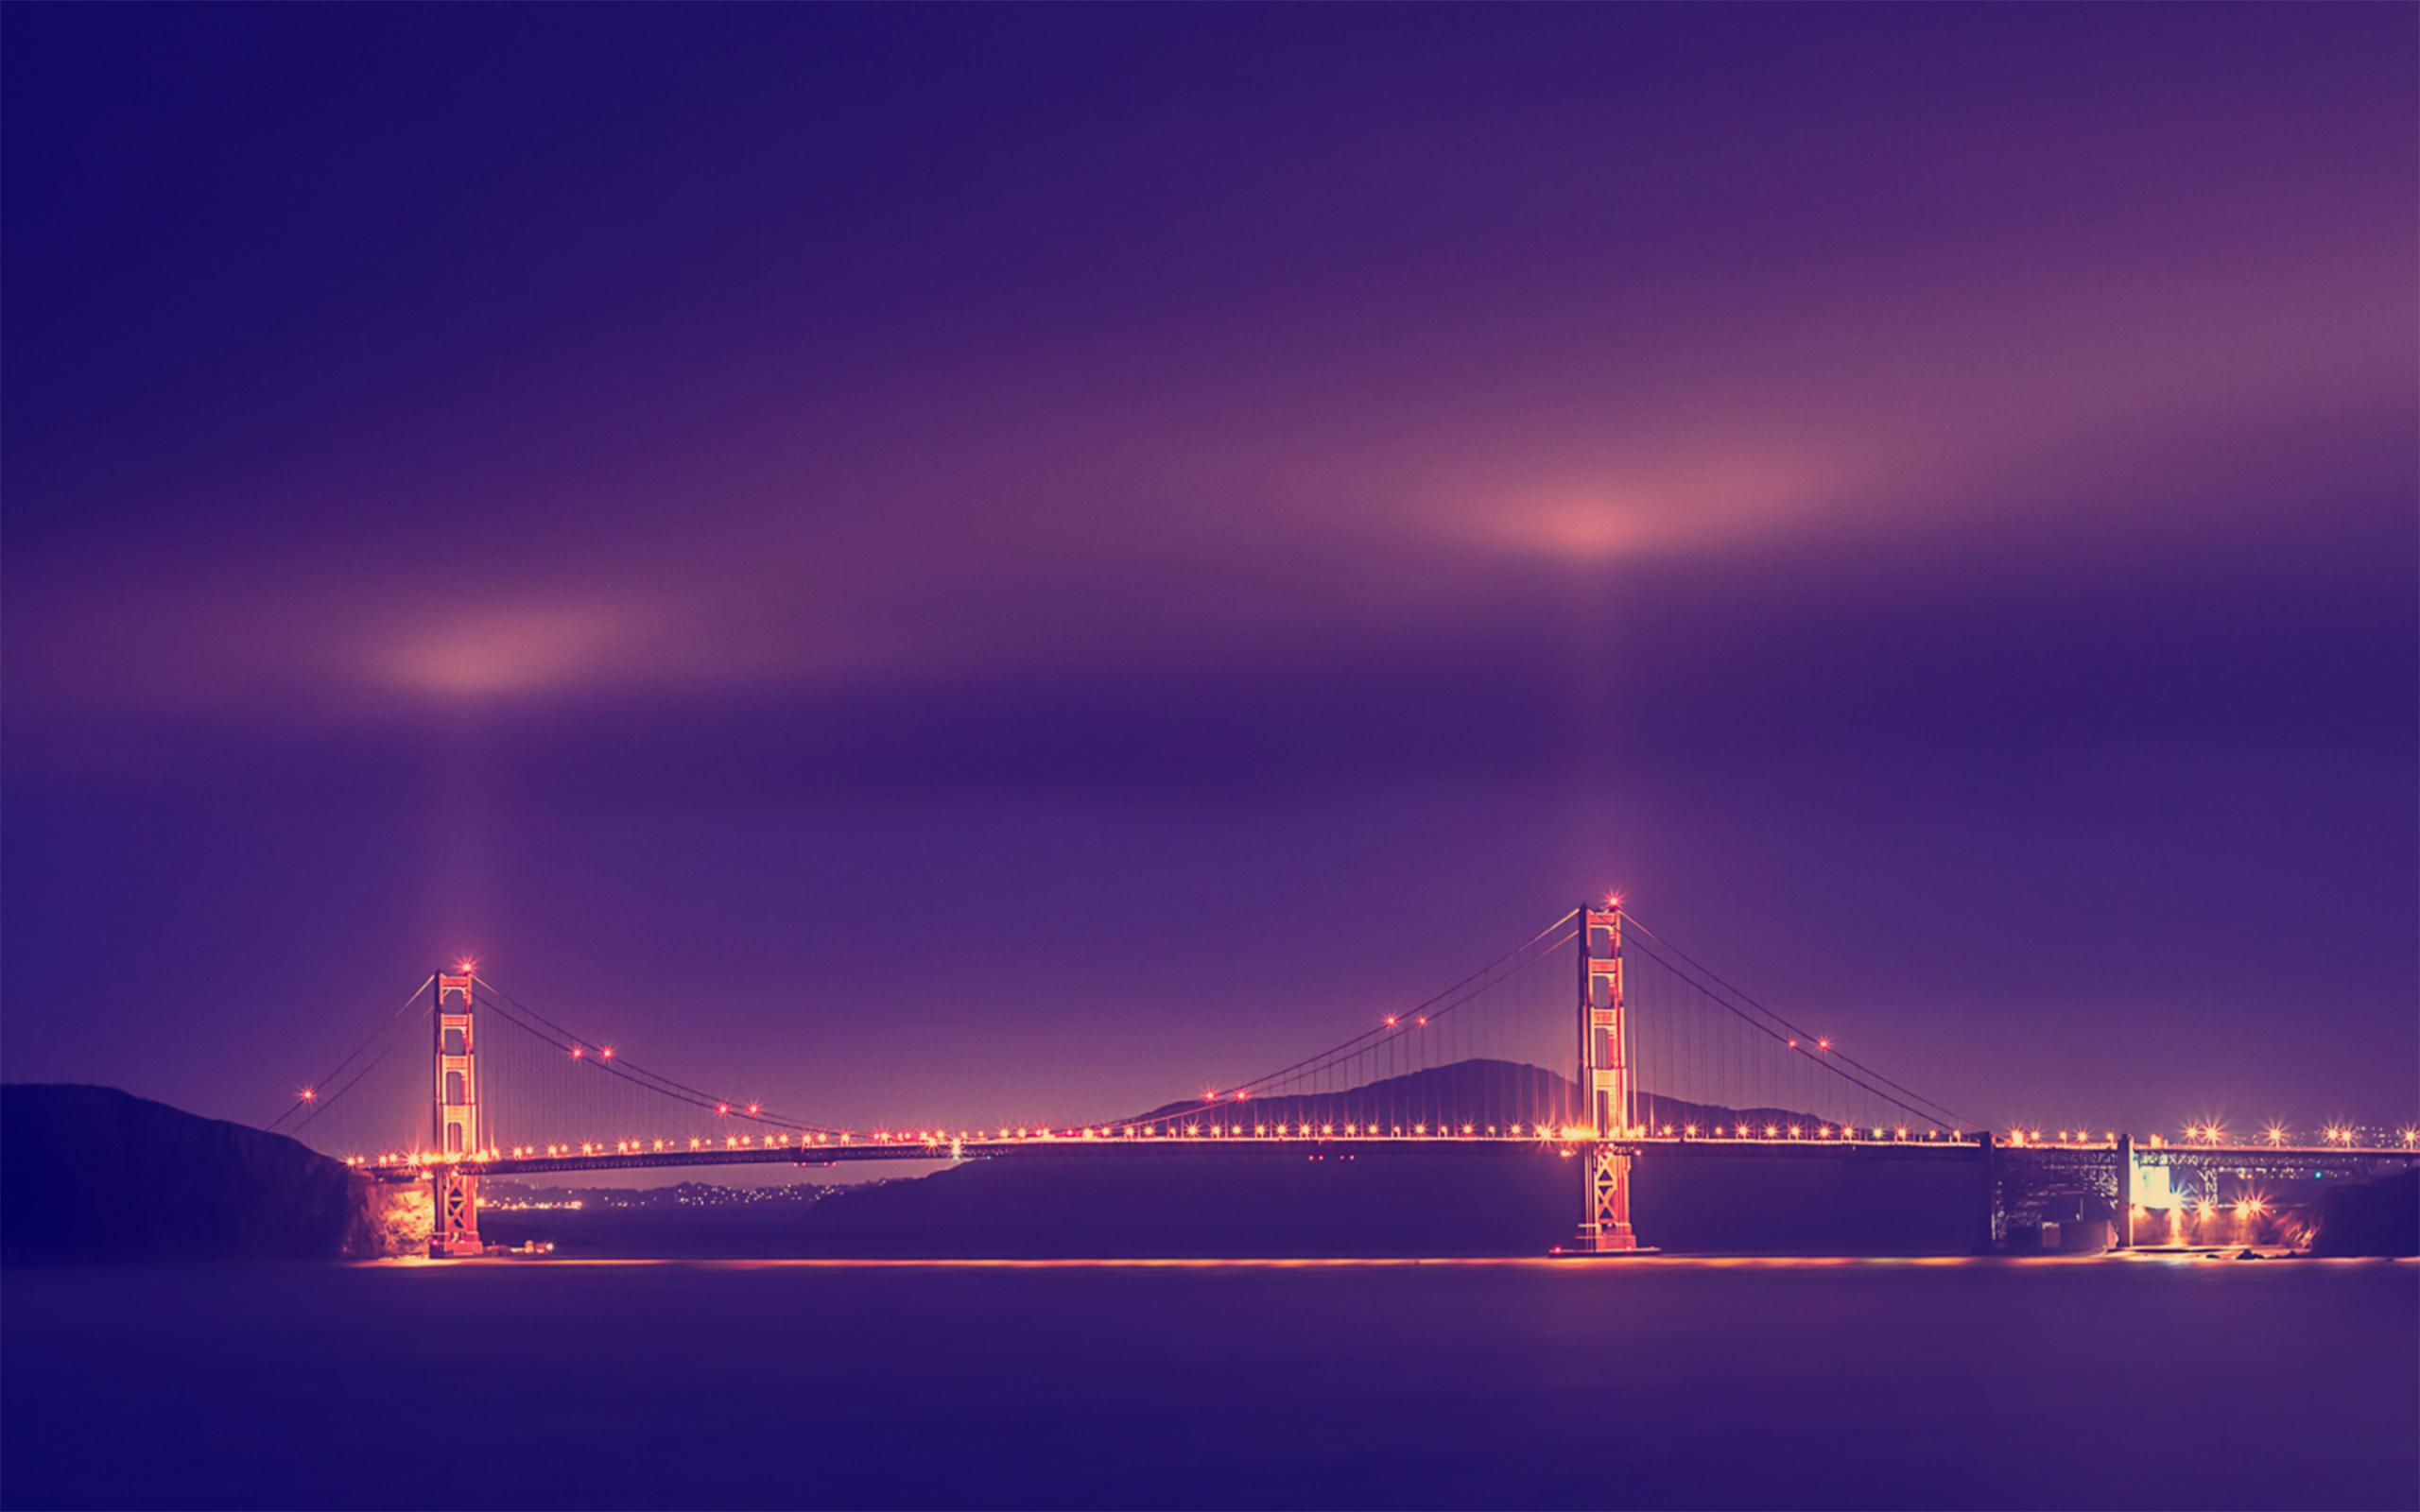 HD Wallpapers San Francisco Golden Gate Bridge